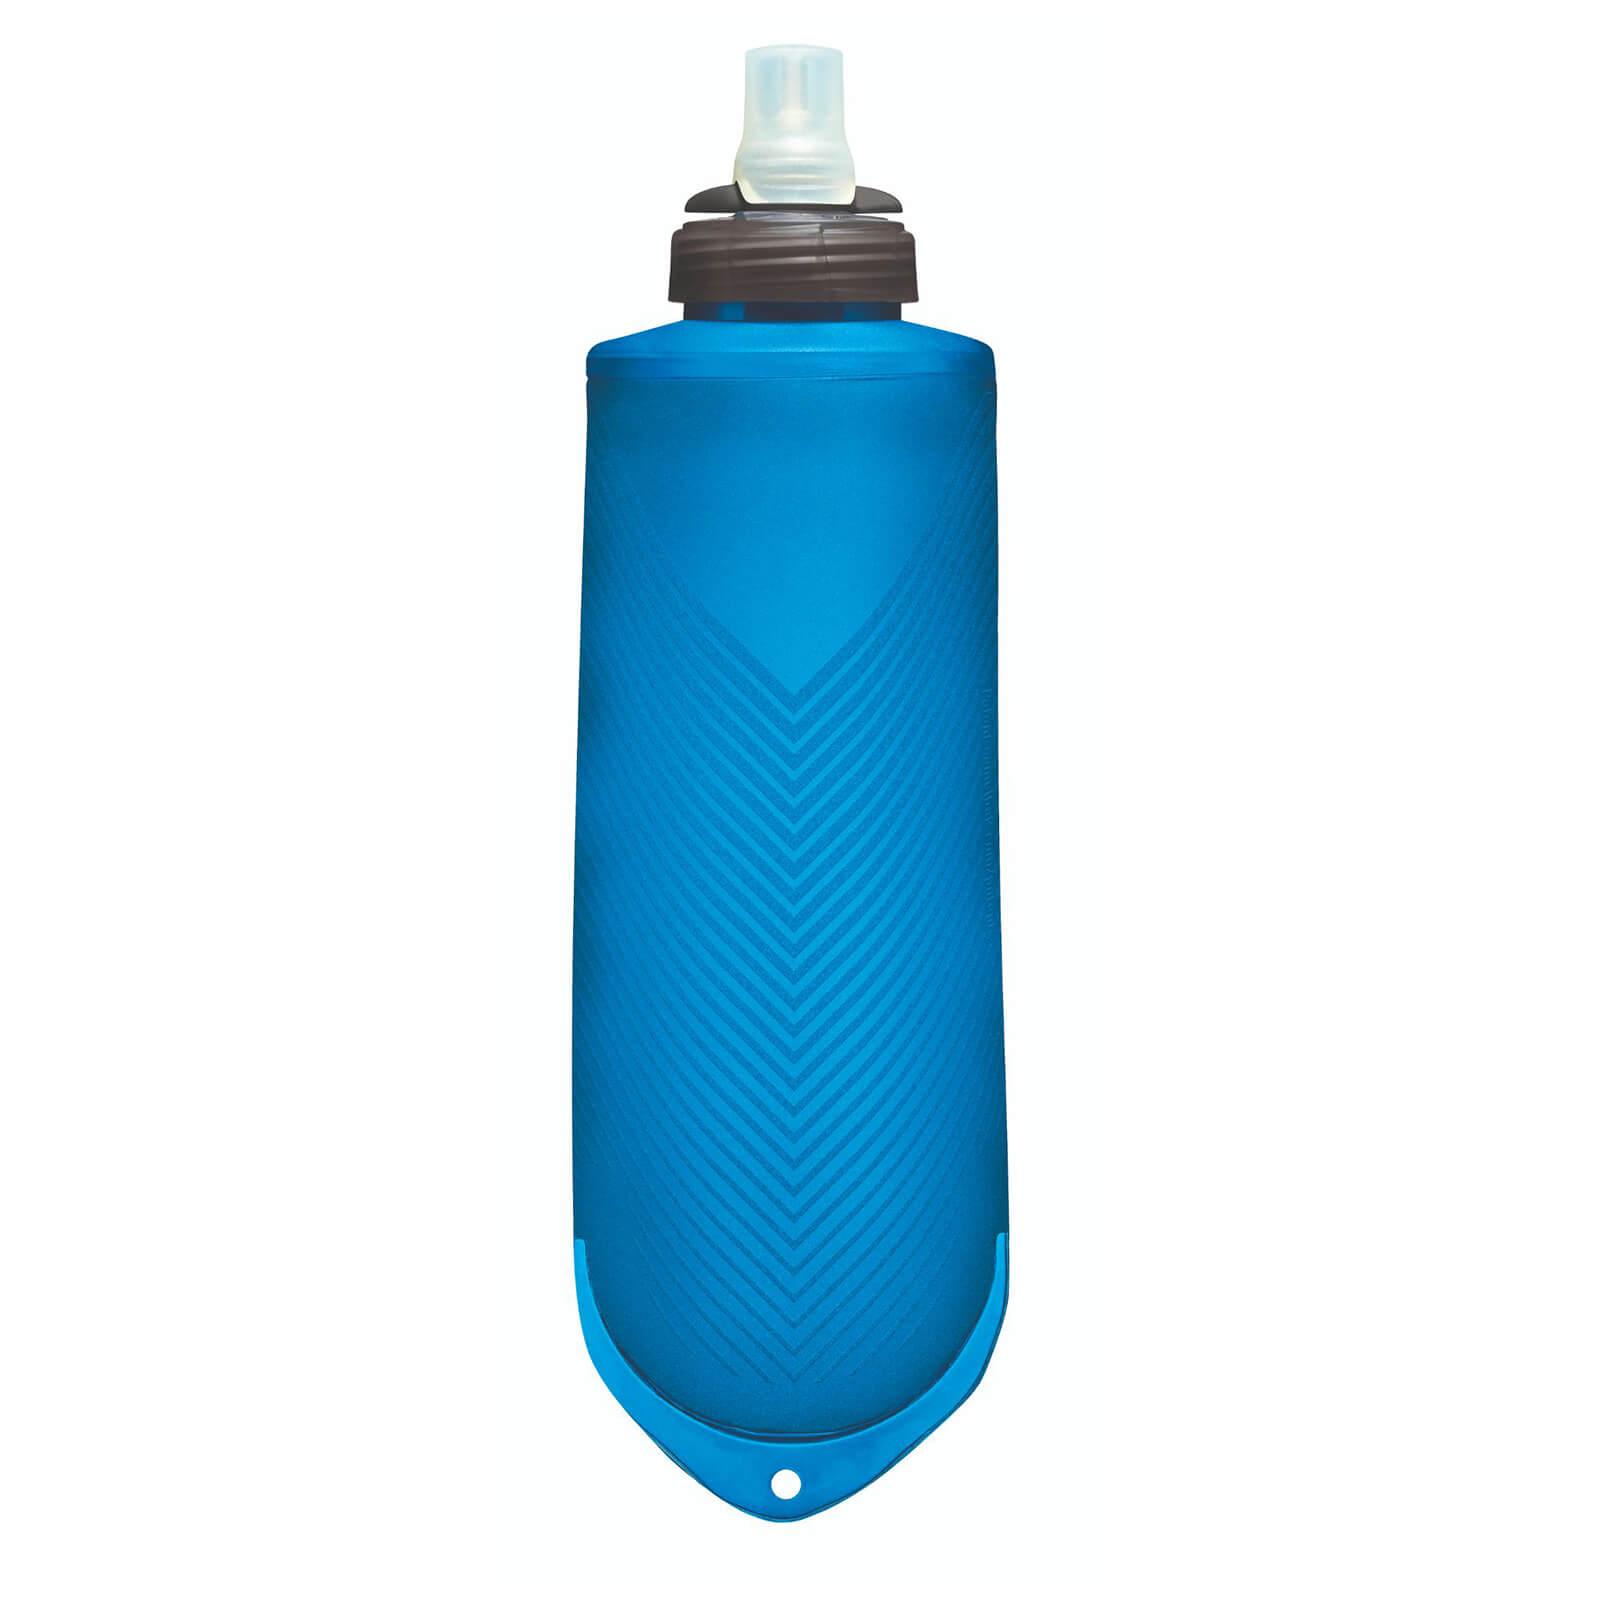 Camelbak 21oz Quick Stow Flask